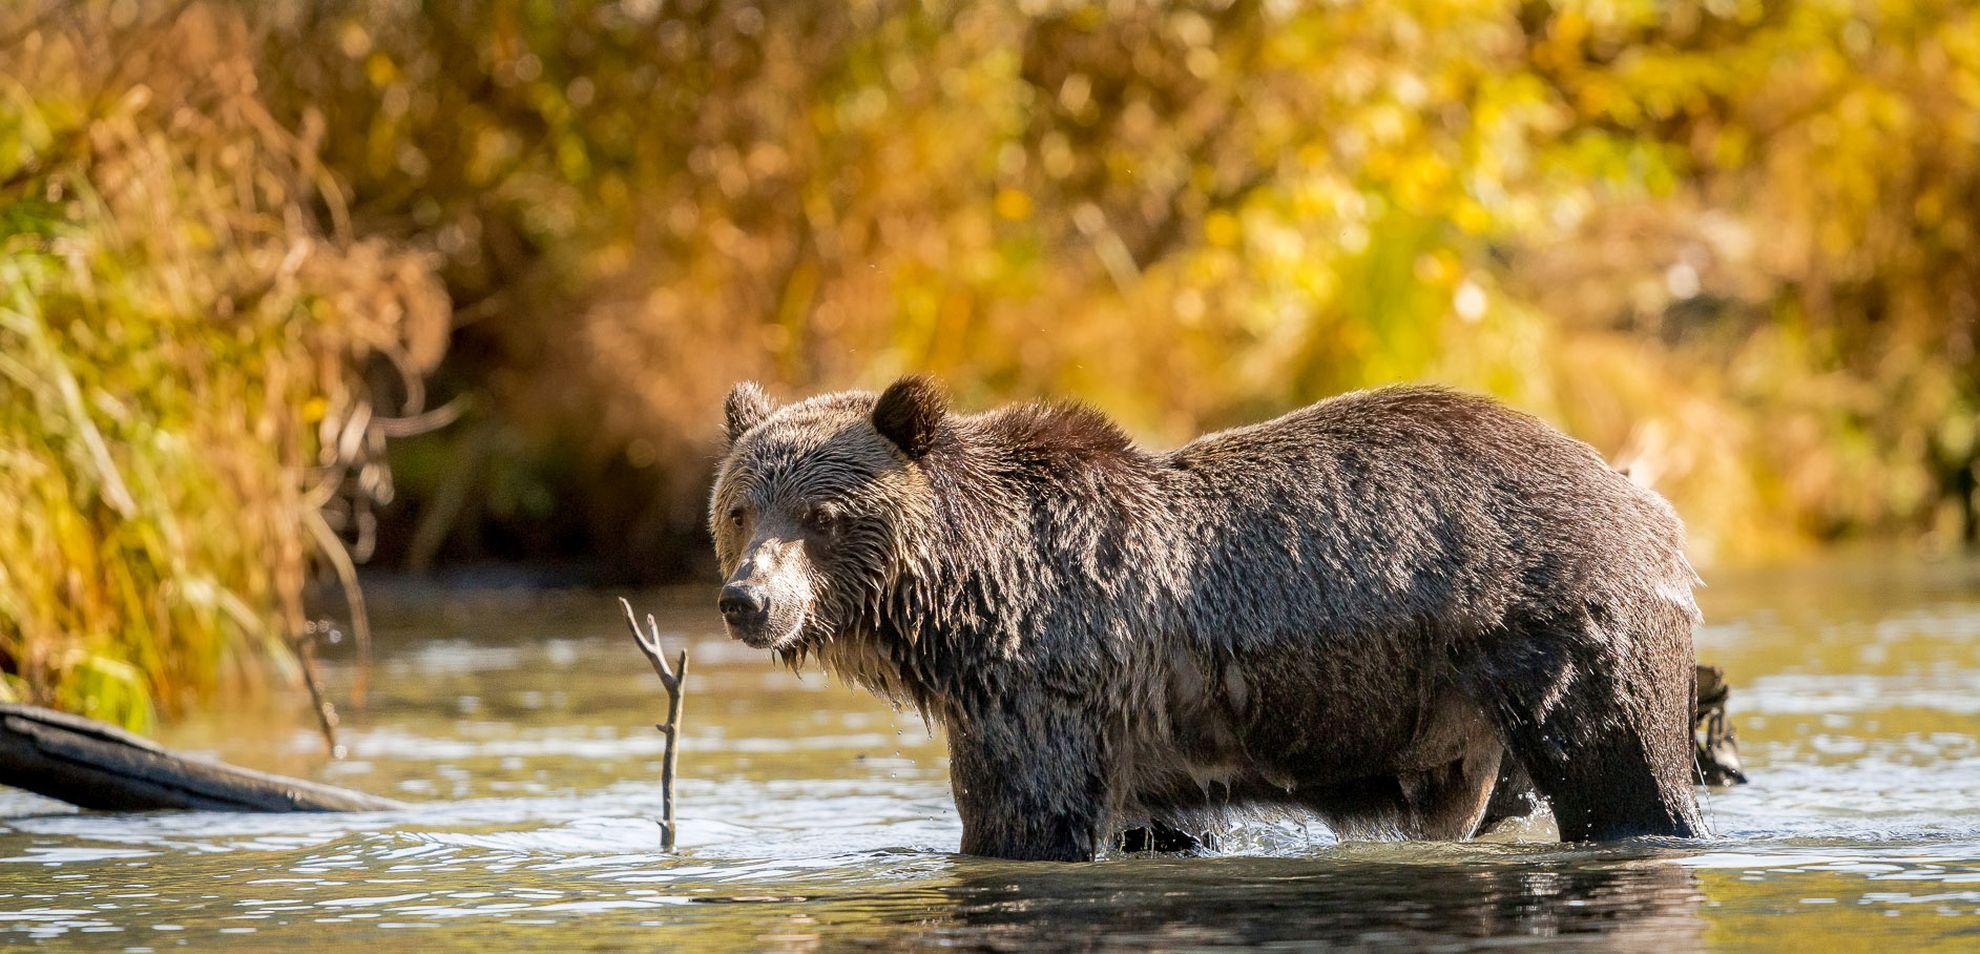 KB 2015 Fall Water Bear DSC00421 1 1 - Viaggio in Canada